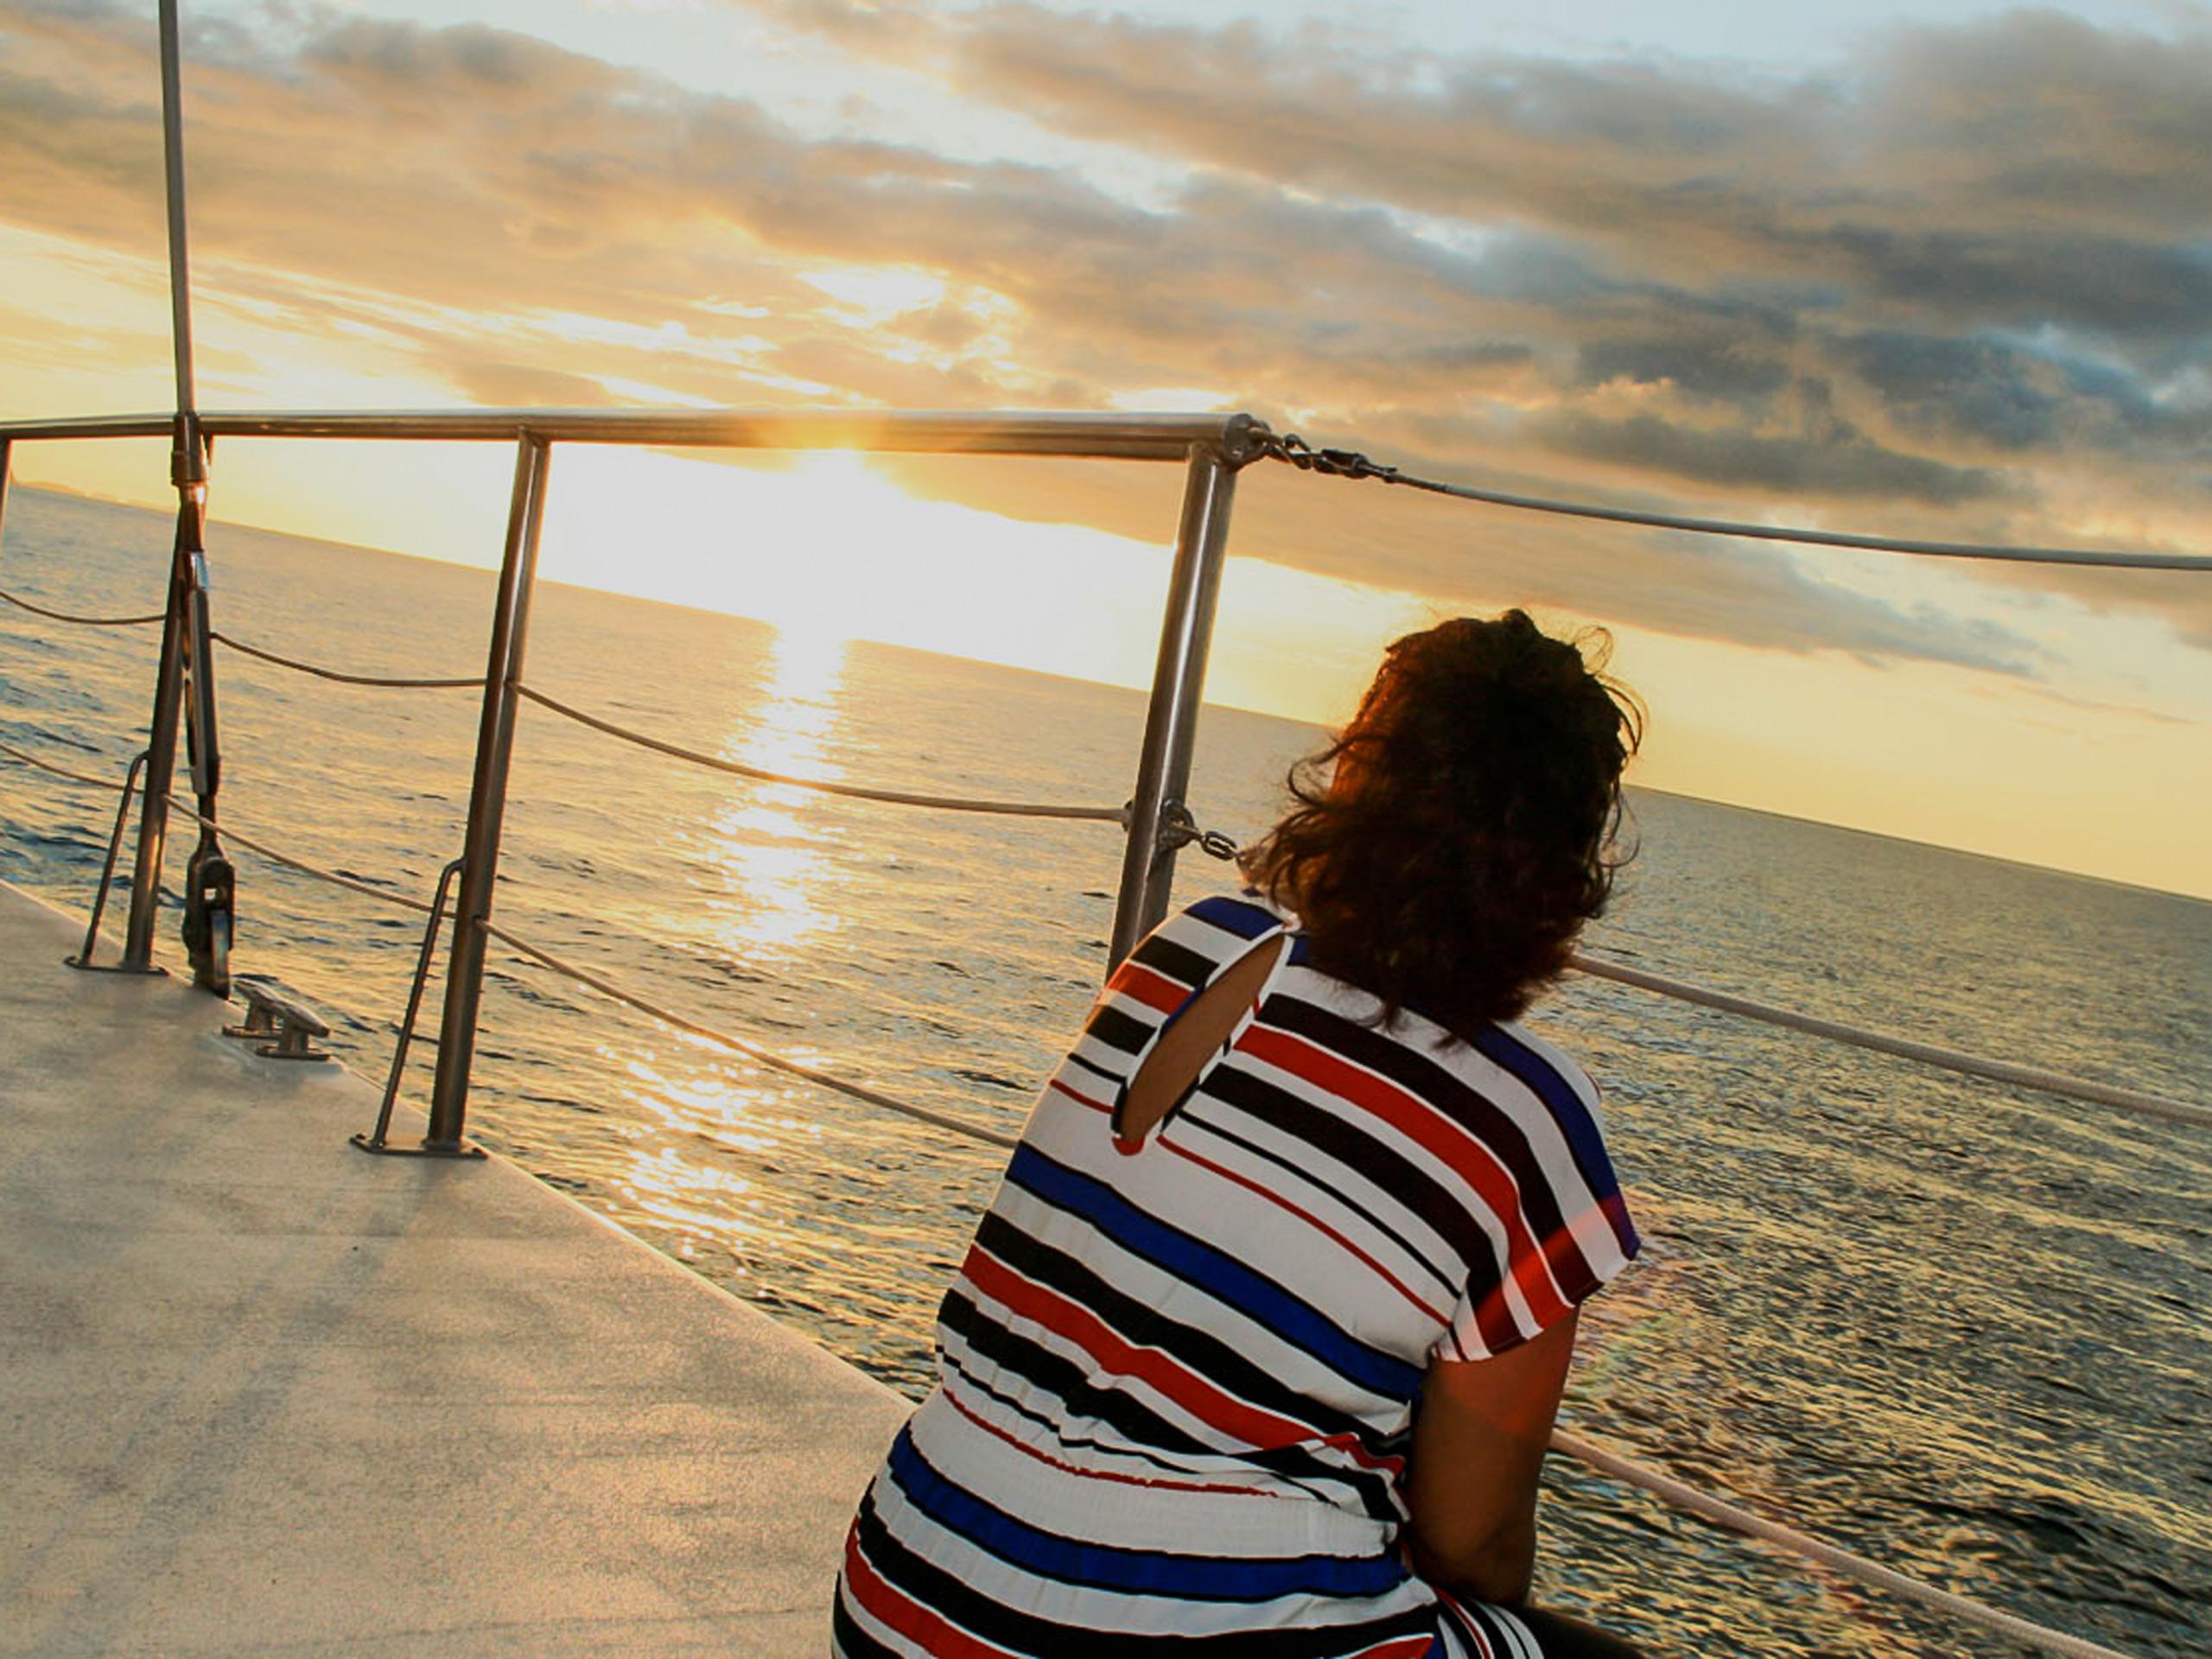 Catamaran journey at sunset